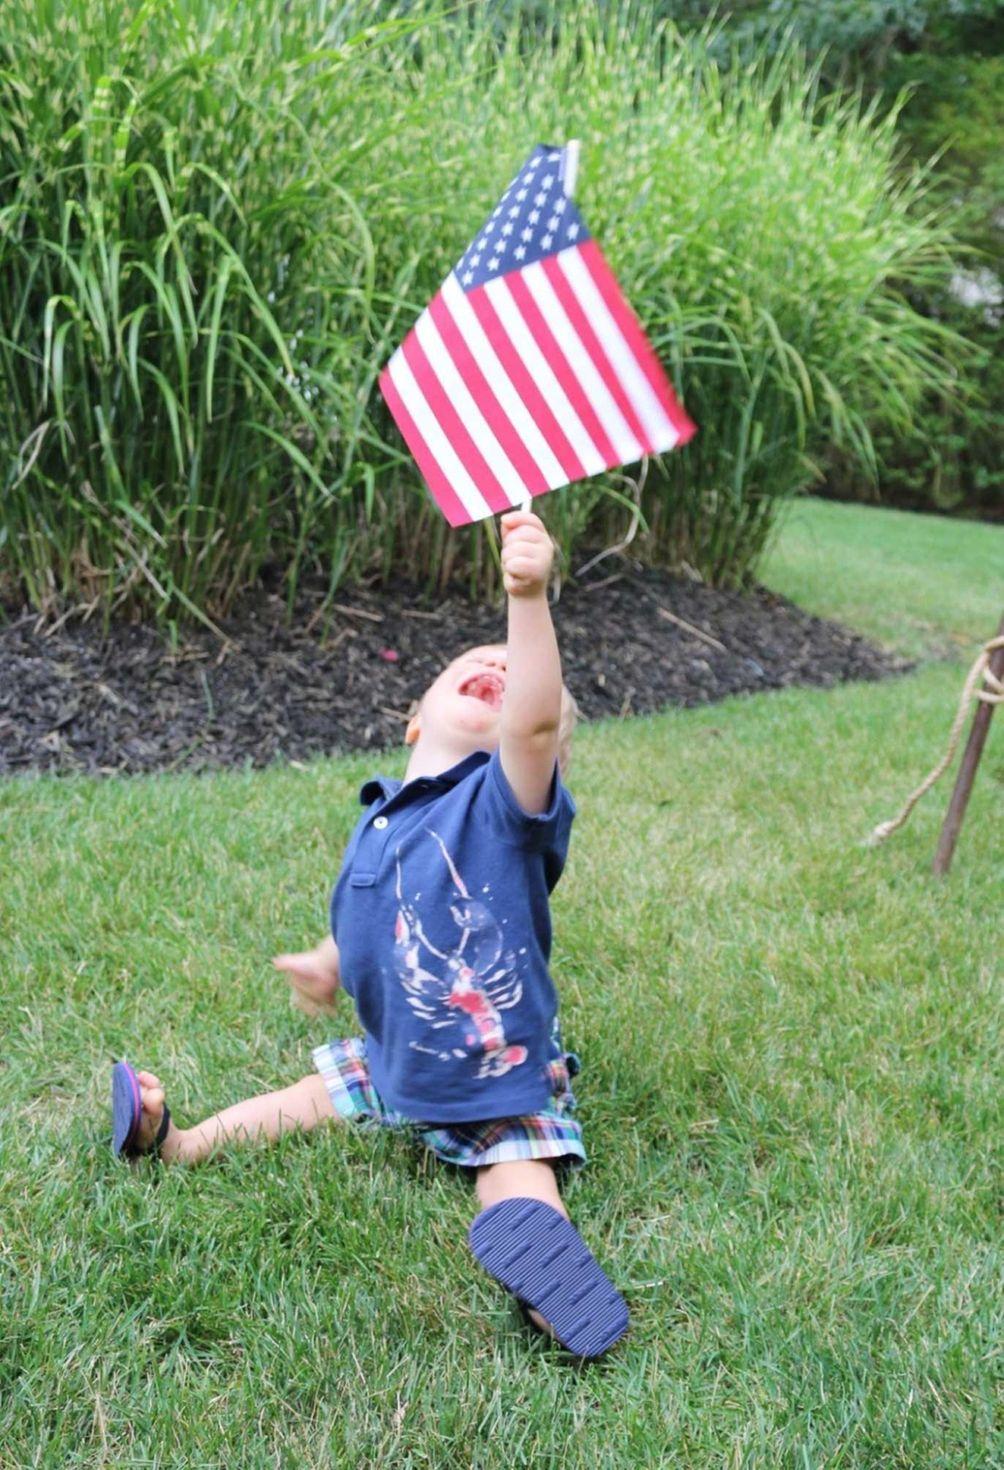 Benji's proud to be an American!